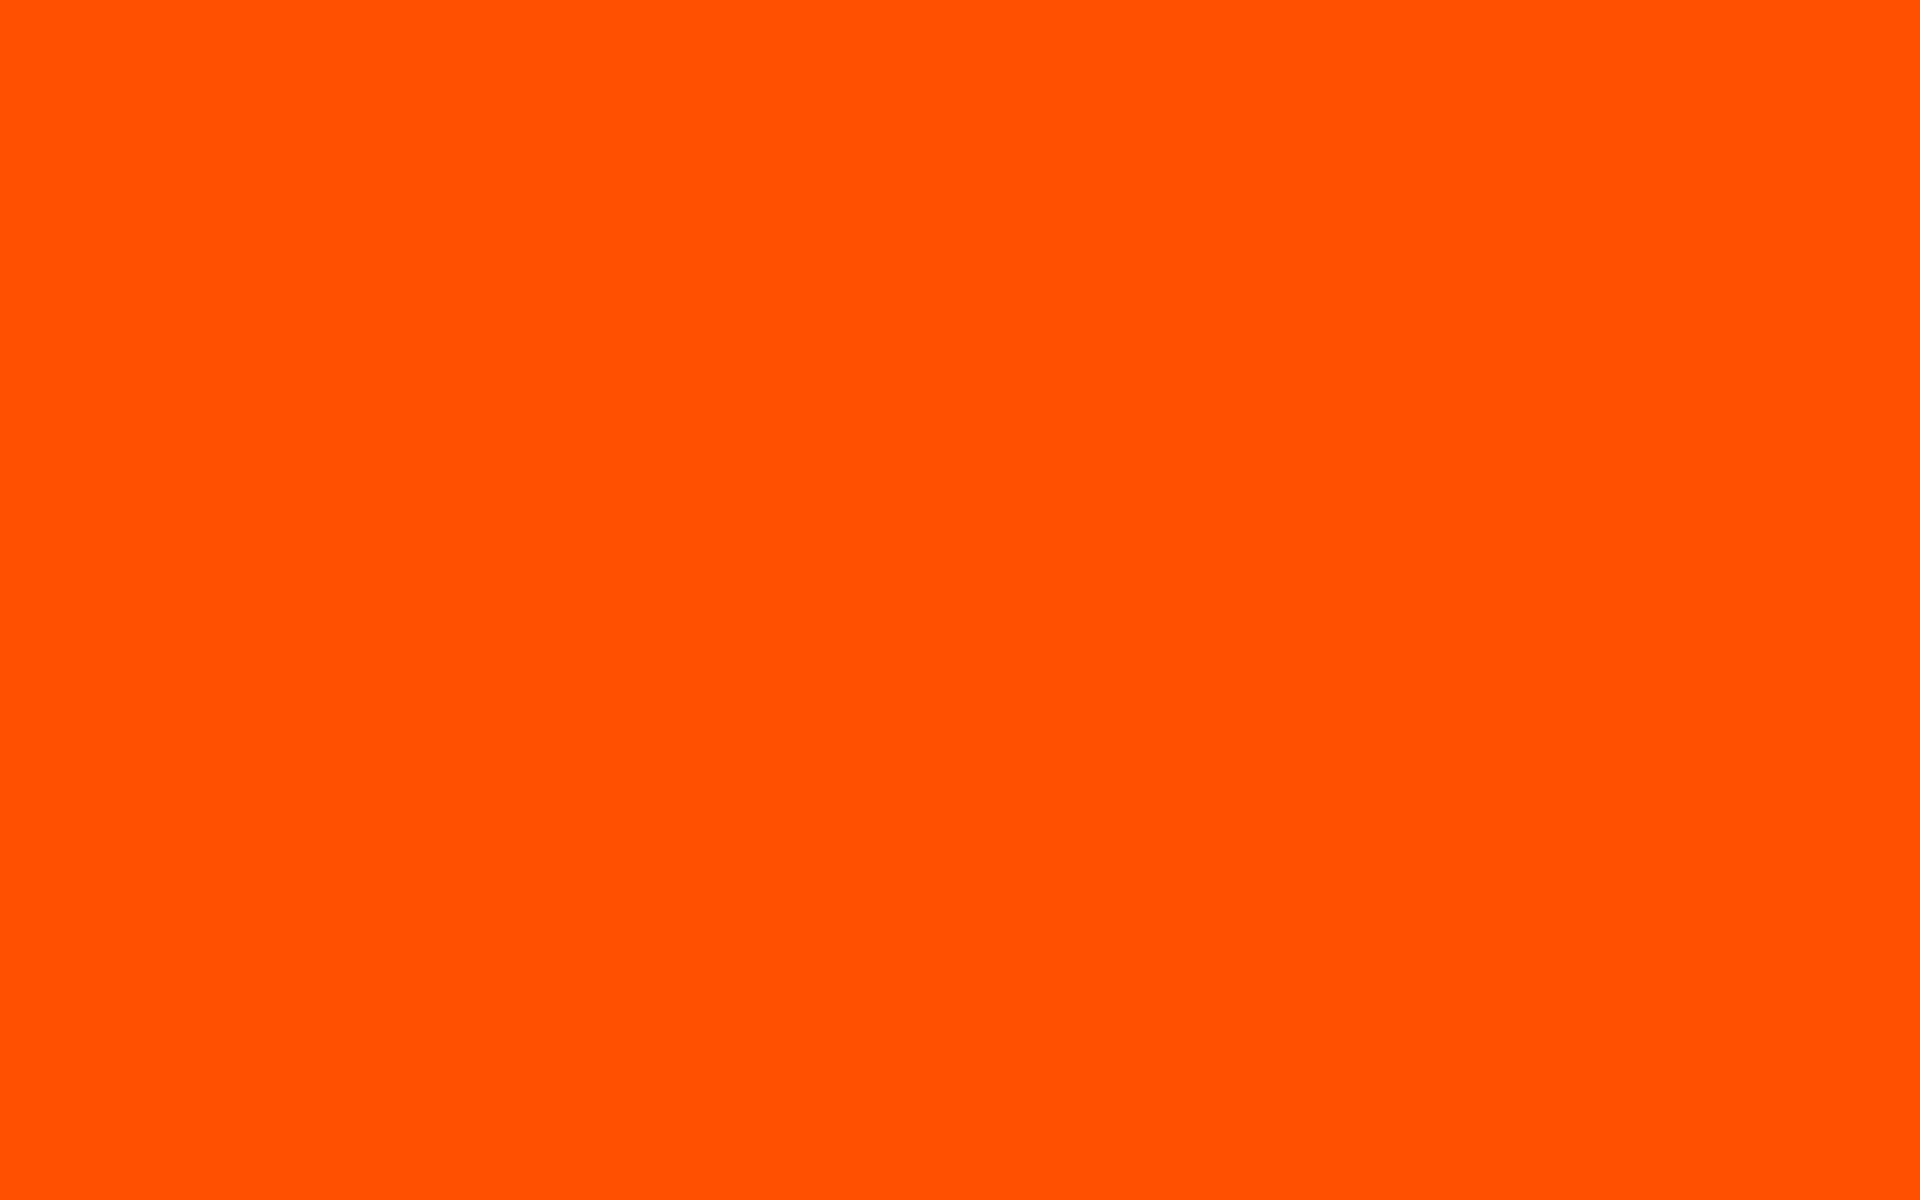 1920x1200 International Orange Aerospace Solid Color Background